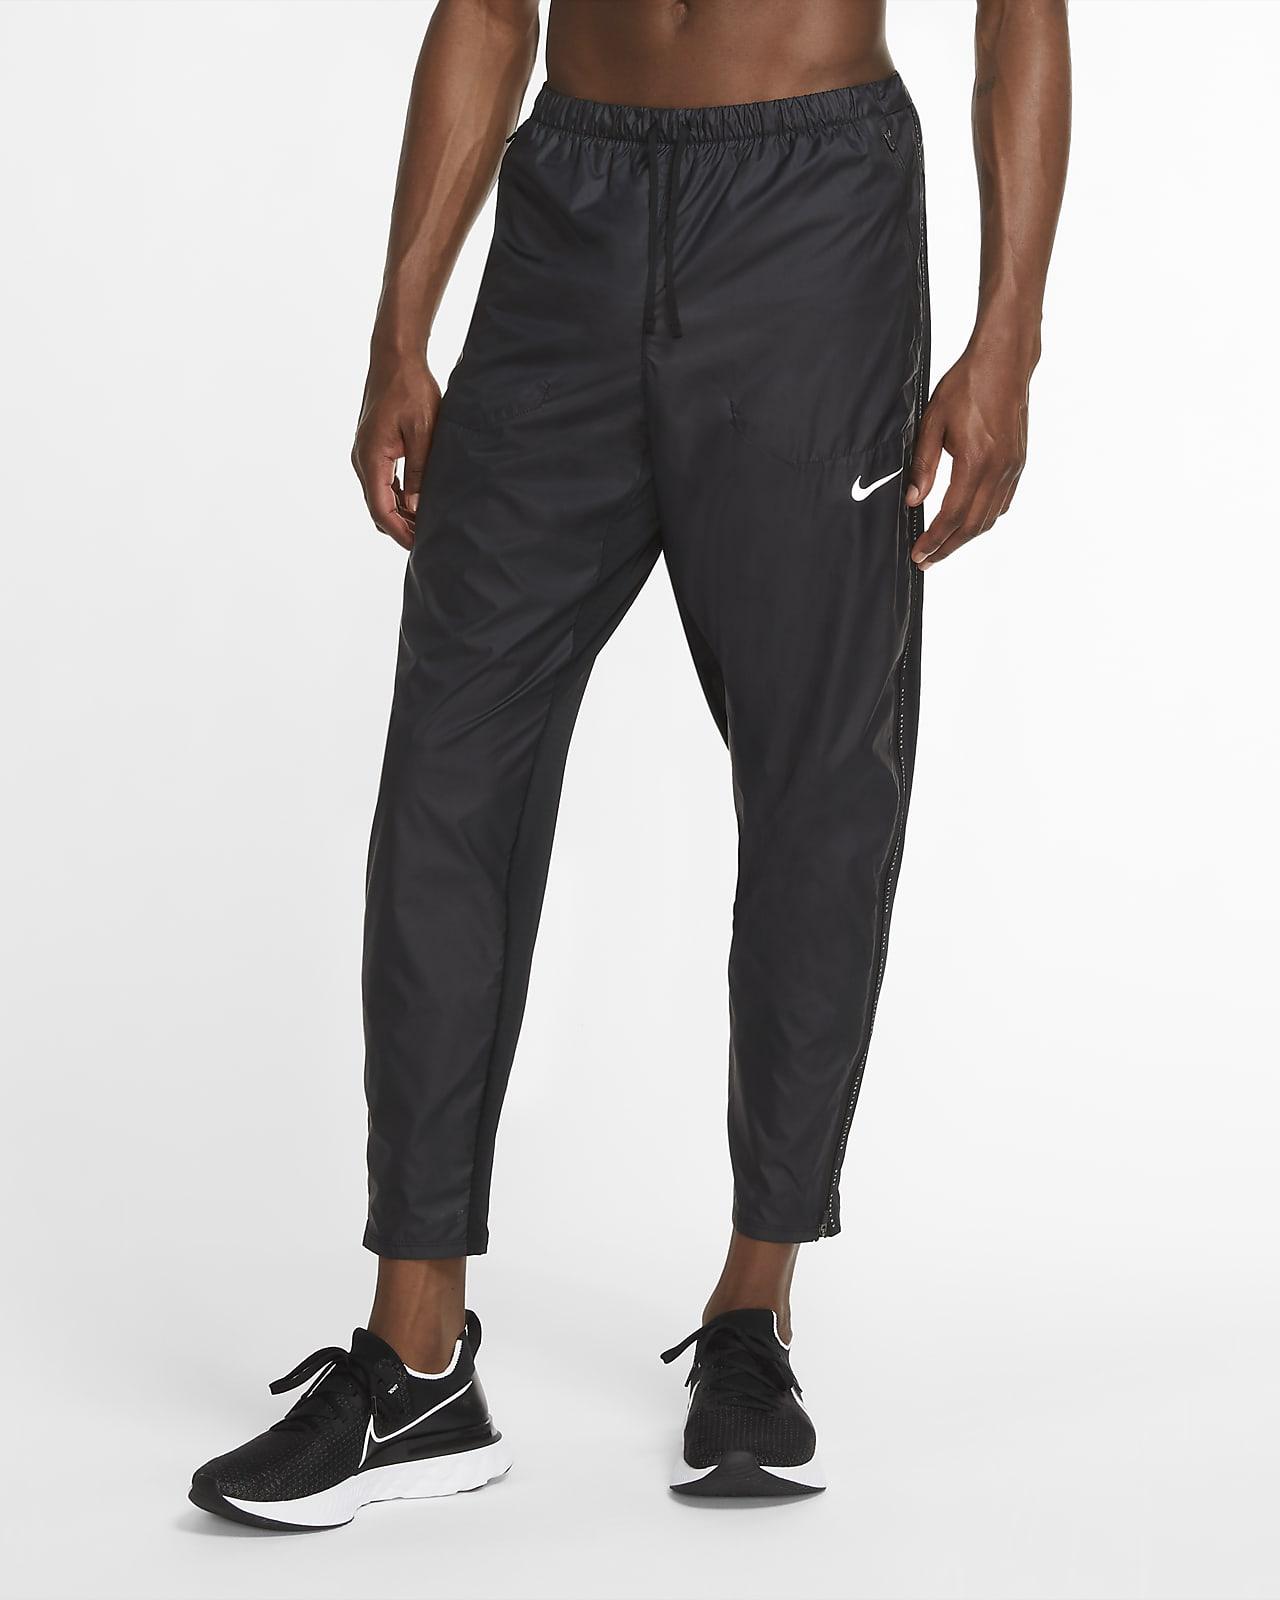 Pantalones de running para hombre Nike Phenom Elite Shield Run Division